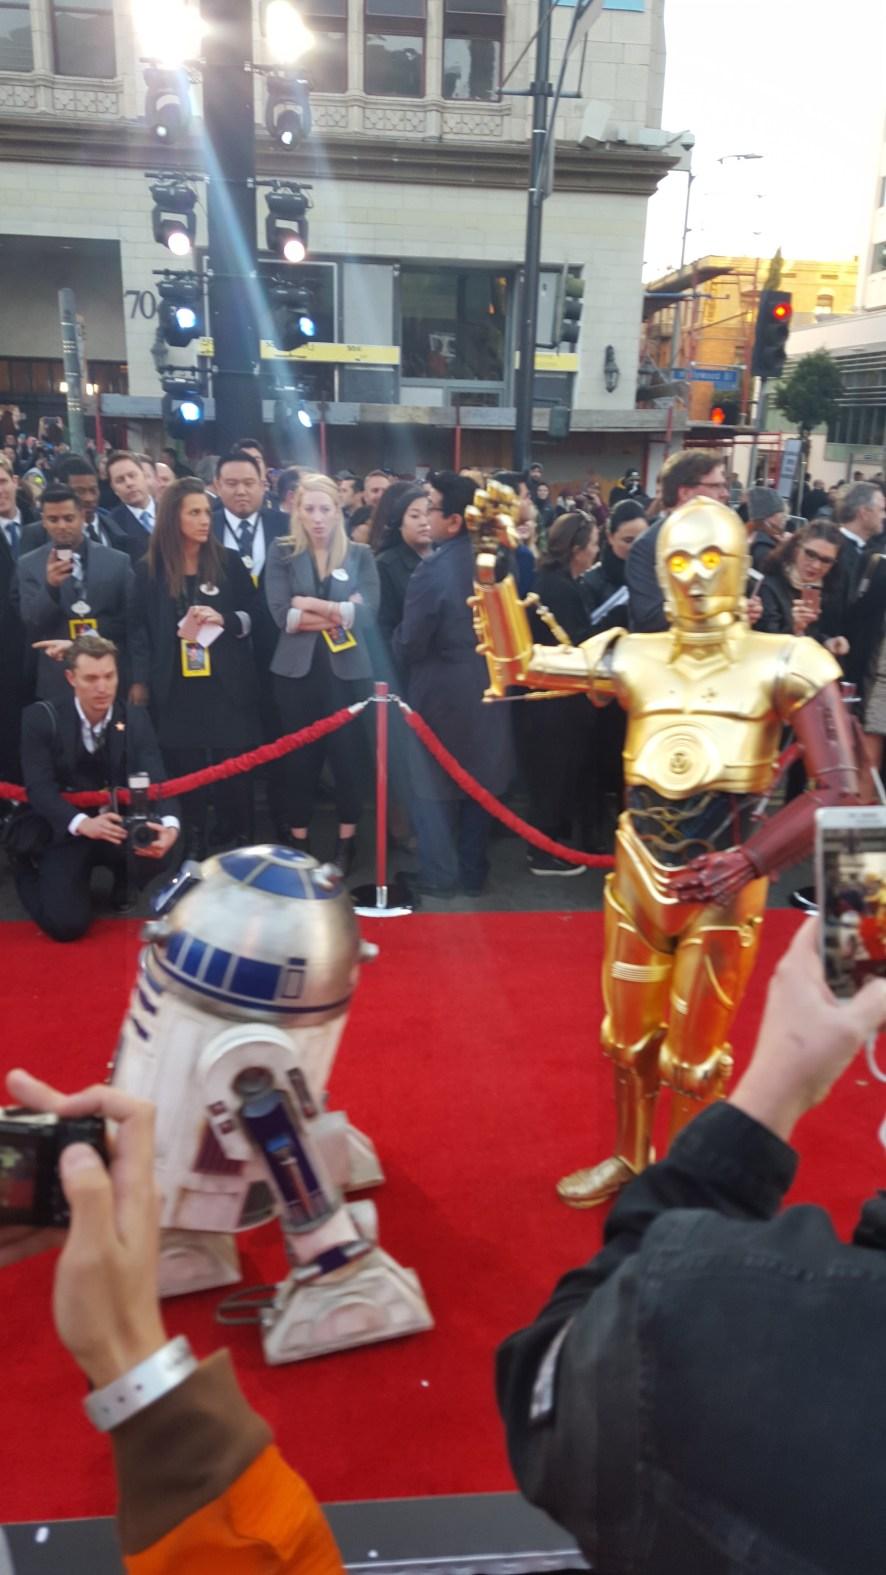 R2-D2 and C-3PO walk the carpet.